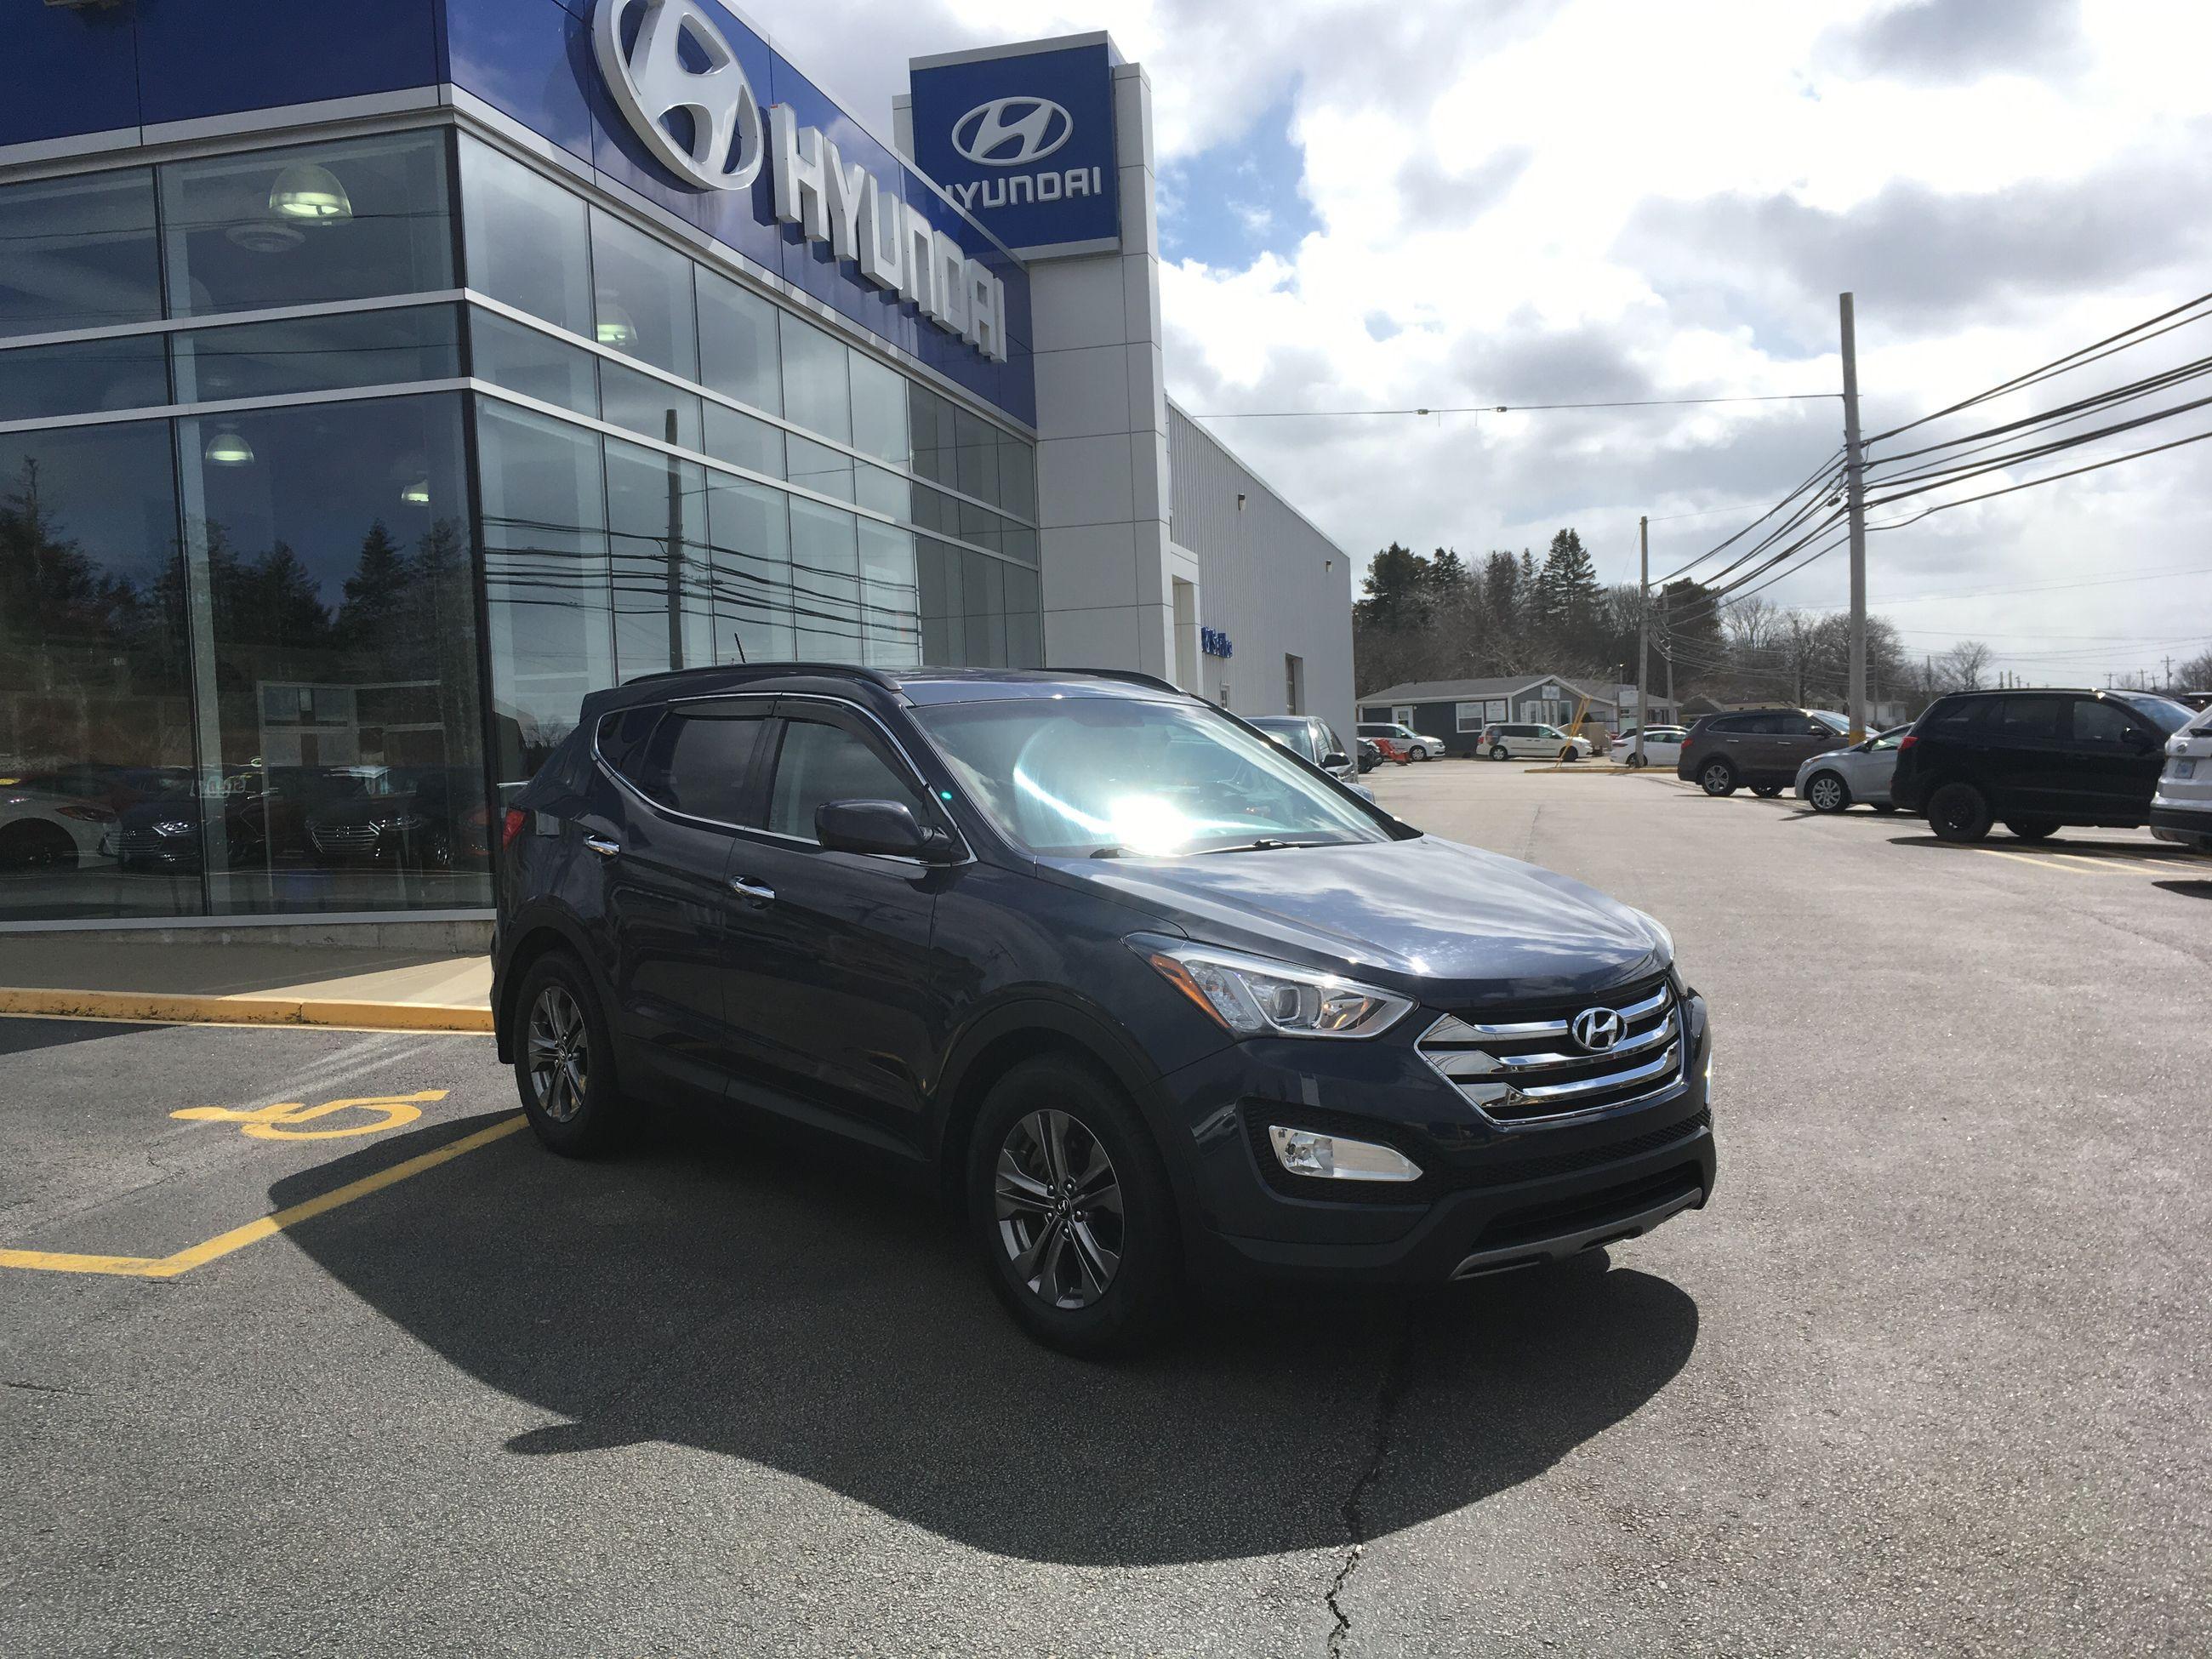 Used 2013 Hyundai Santa Fe Sport PRE FWD in Dayton Used inventory